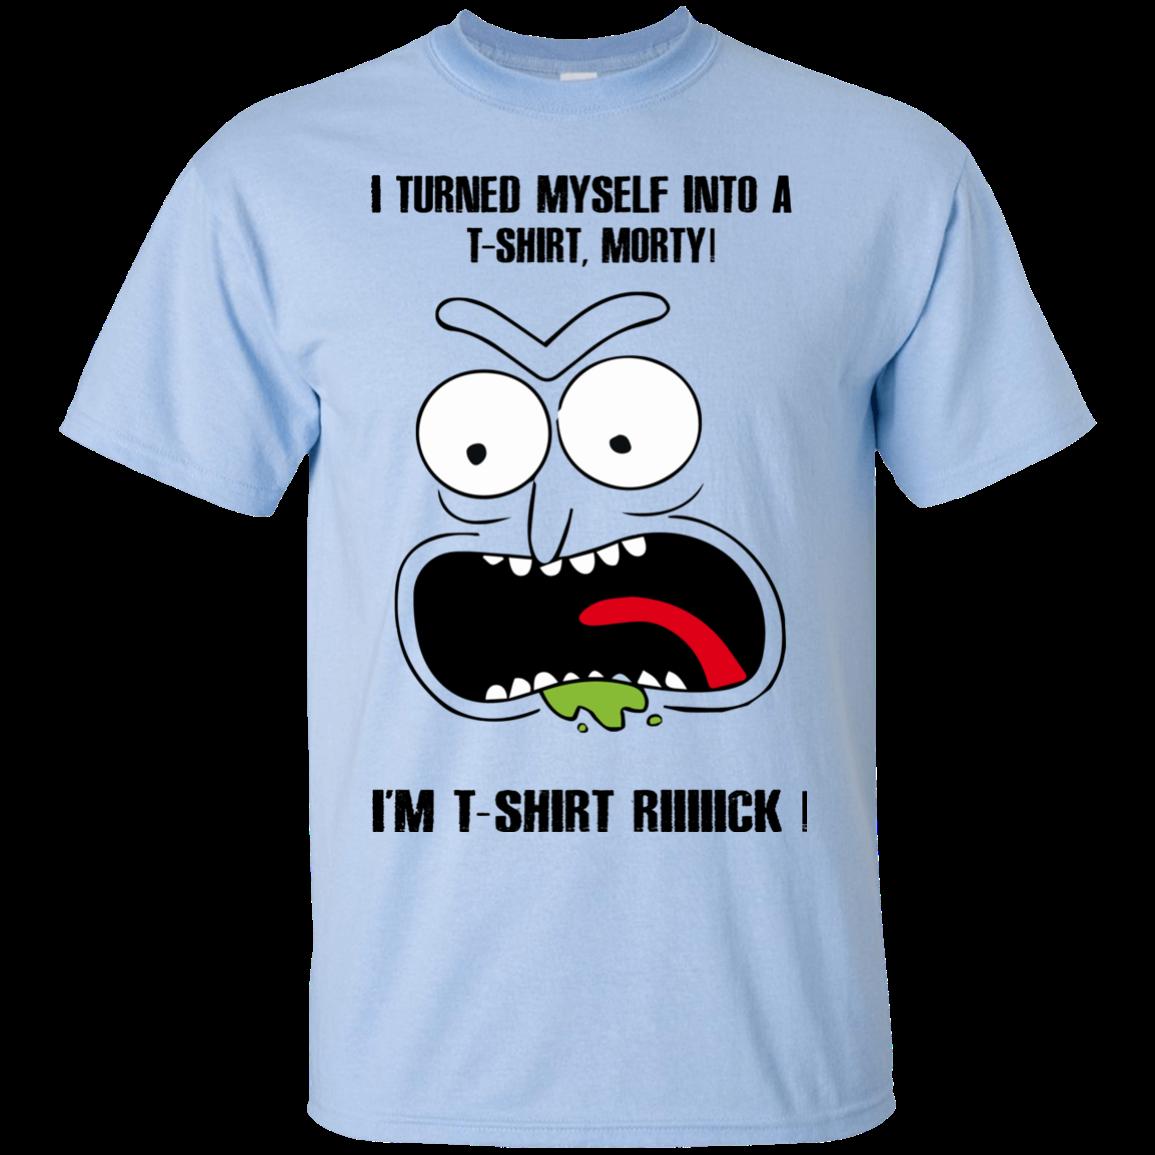 Schwifty Things TV Show Wubba Lubba Dub Gift Short Sleeve T-Shirt Tees Tshirts